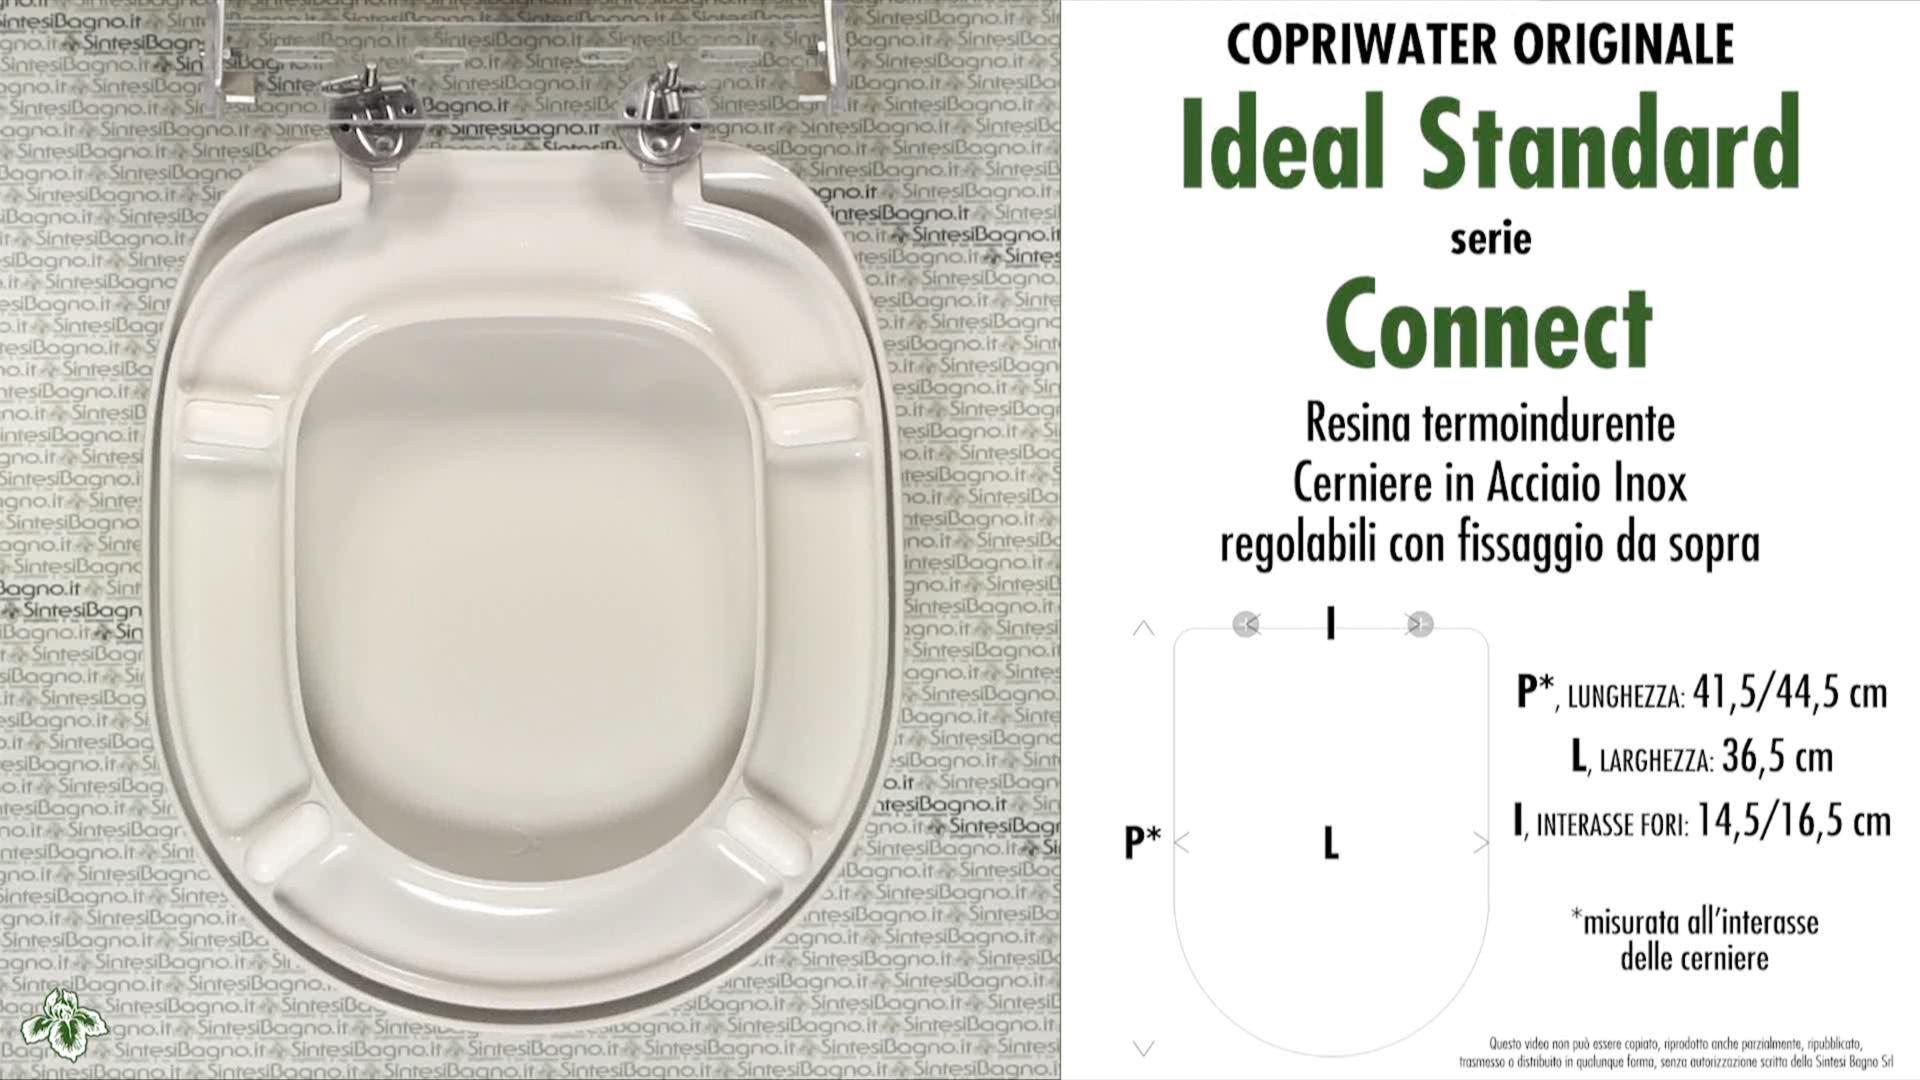 Schede tecniche misure copriwater ideal standard serie connect for Misure copriwater ideal standard